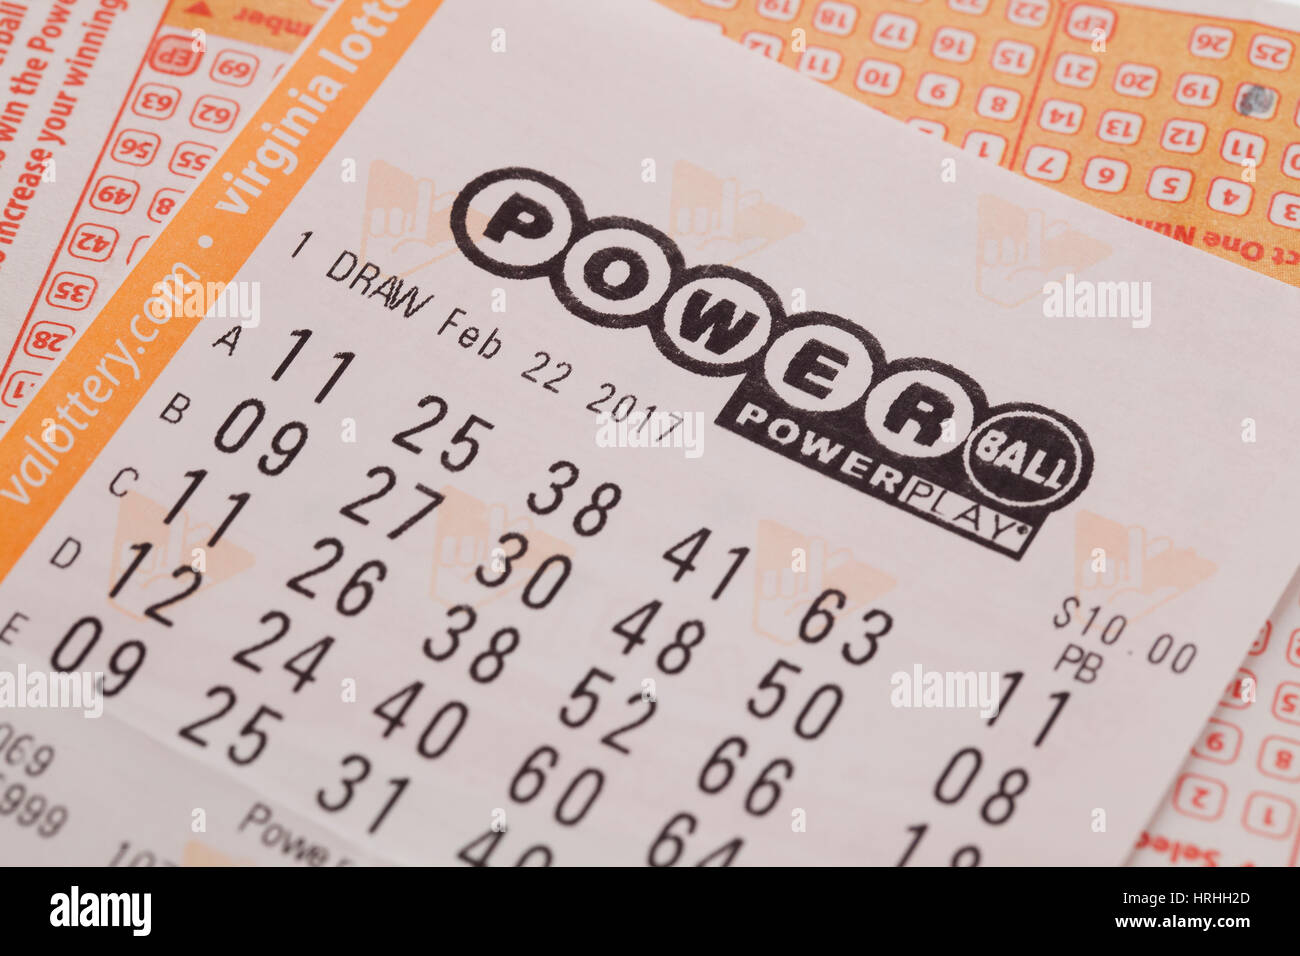 Power Ball lottery ticket - USA - Stock Image